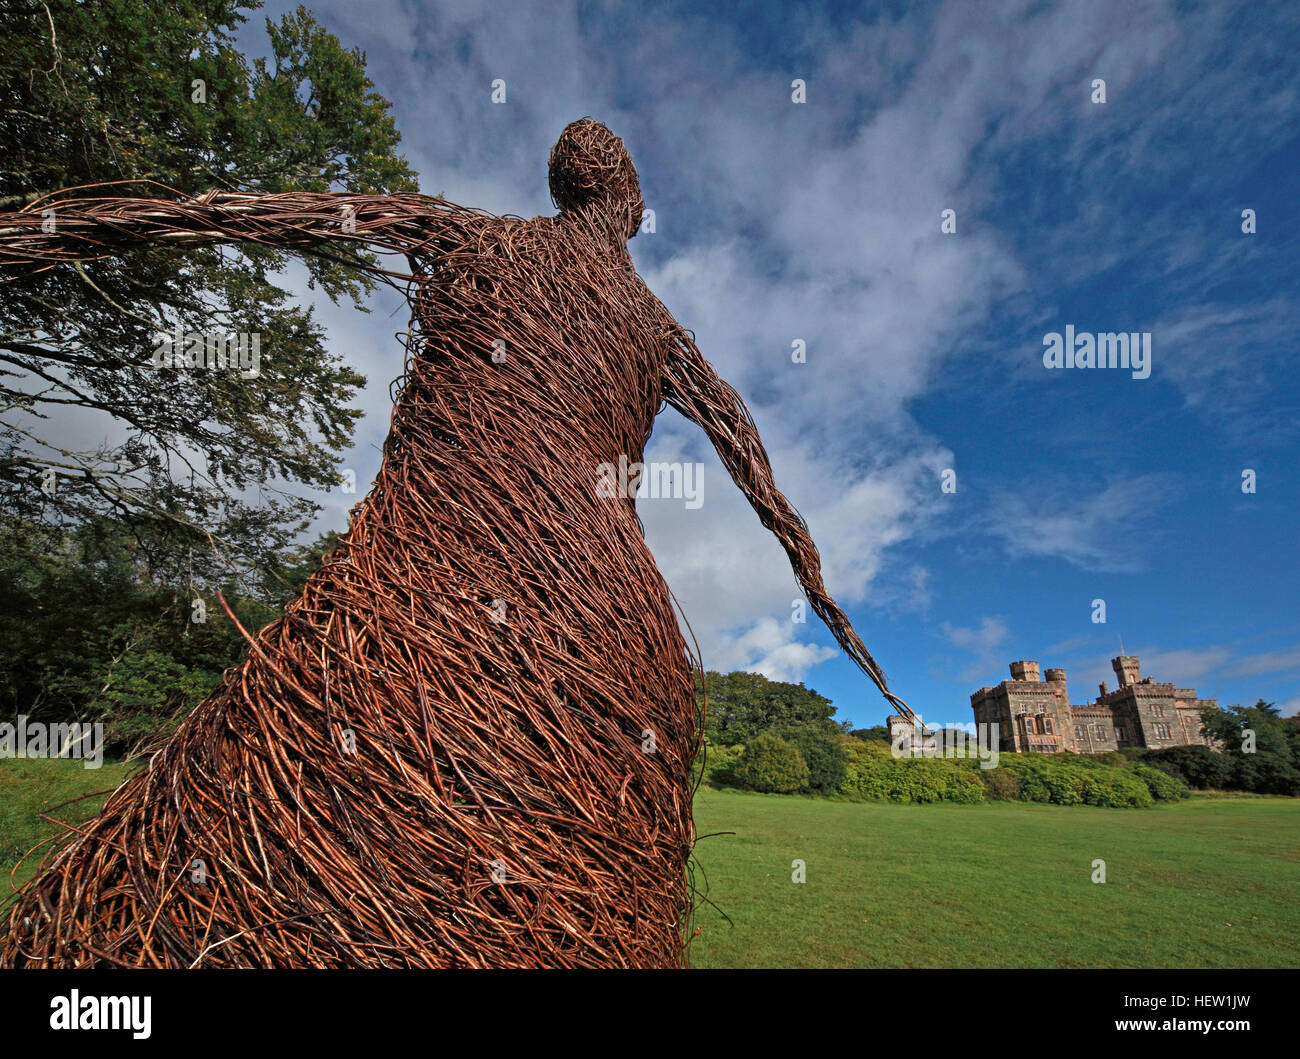 The wicker woman of Stornoway Isle Of Lewis,Scotland,UK - Stock Image